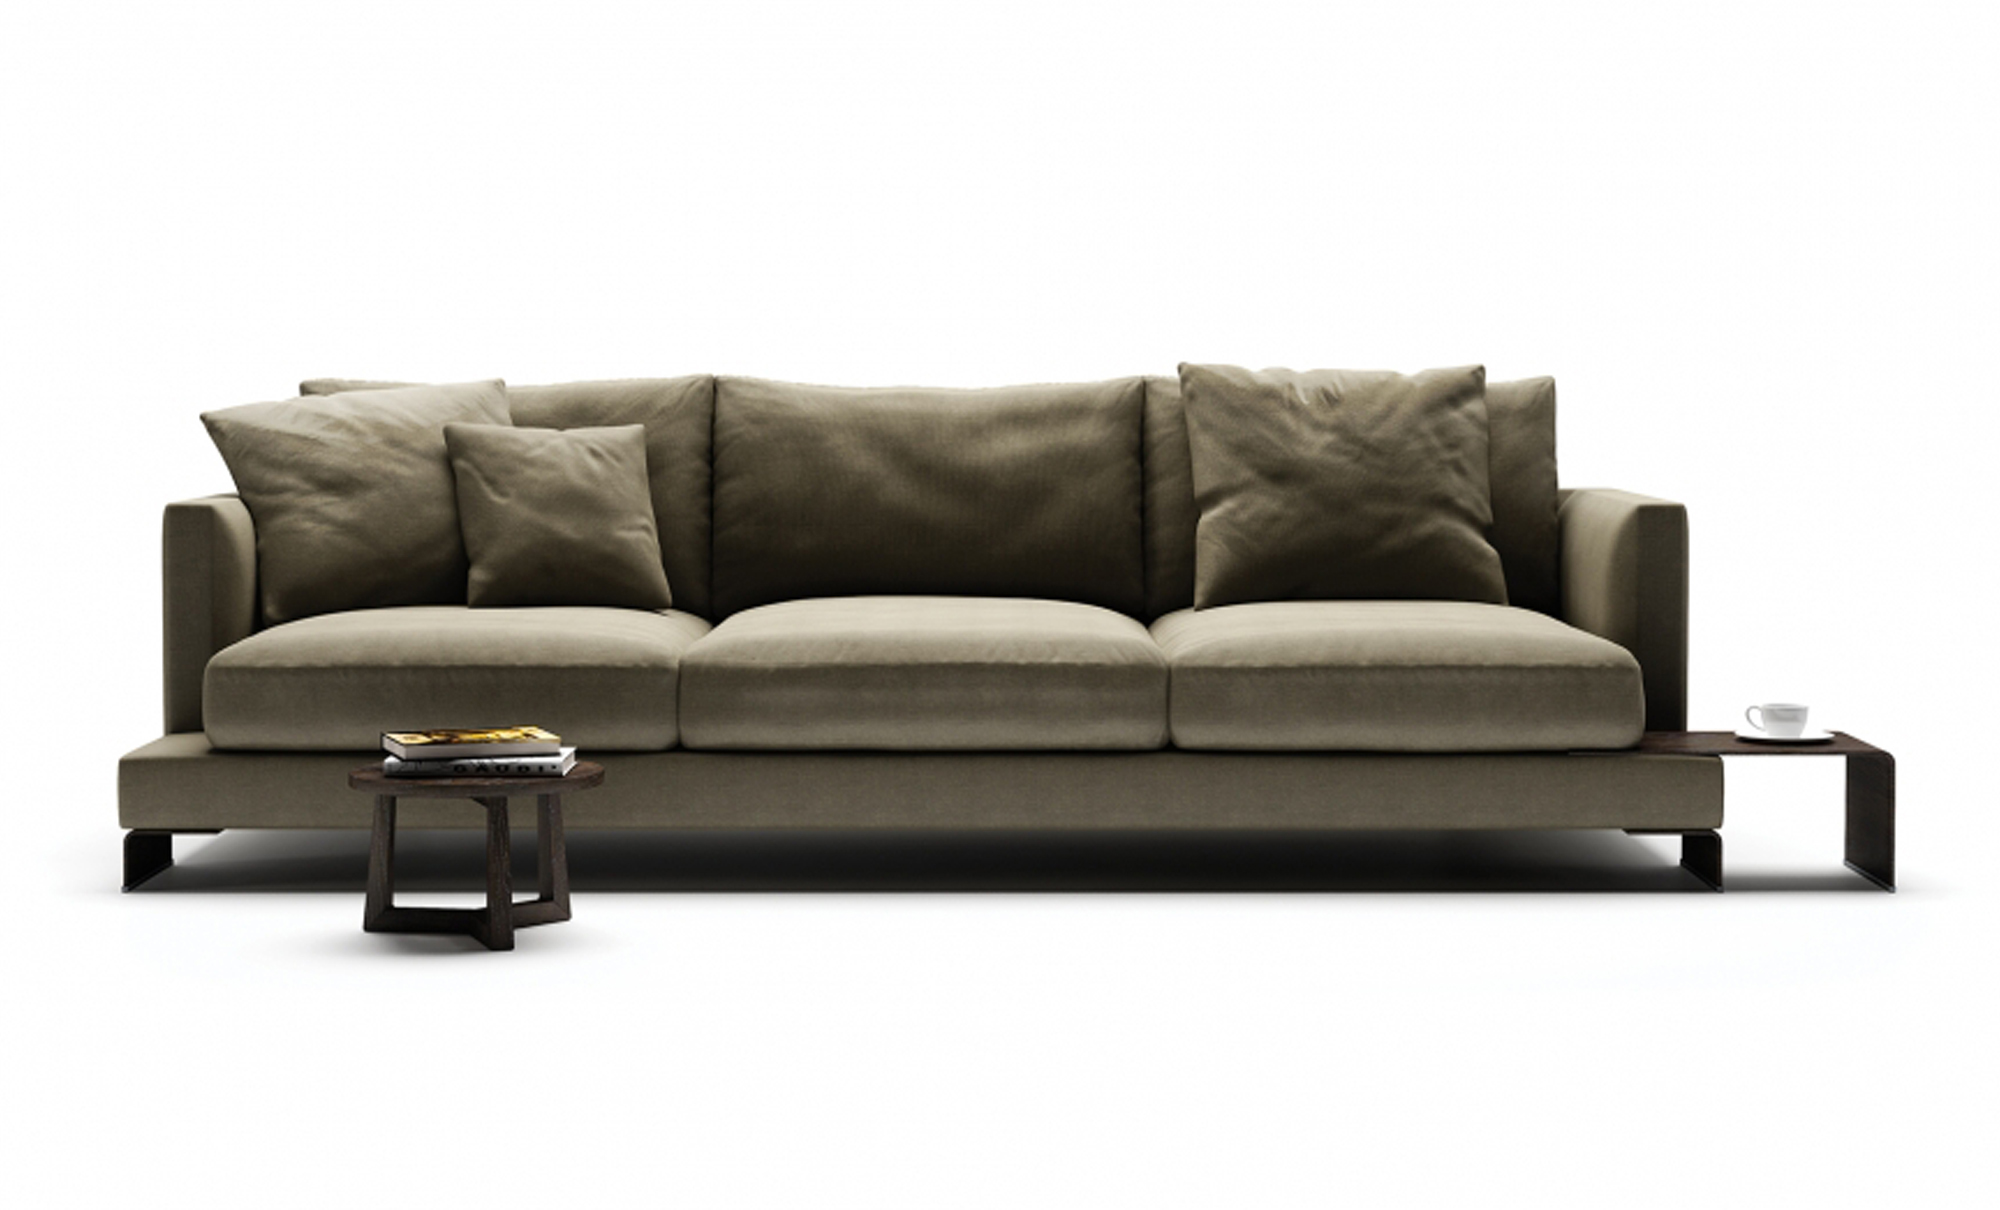 Swell Long Island Sofas Fanuli Furniture Interior Design Ideas Clesiryabchikinfo